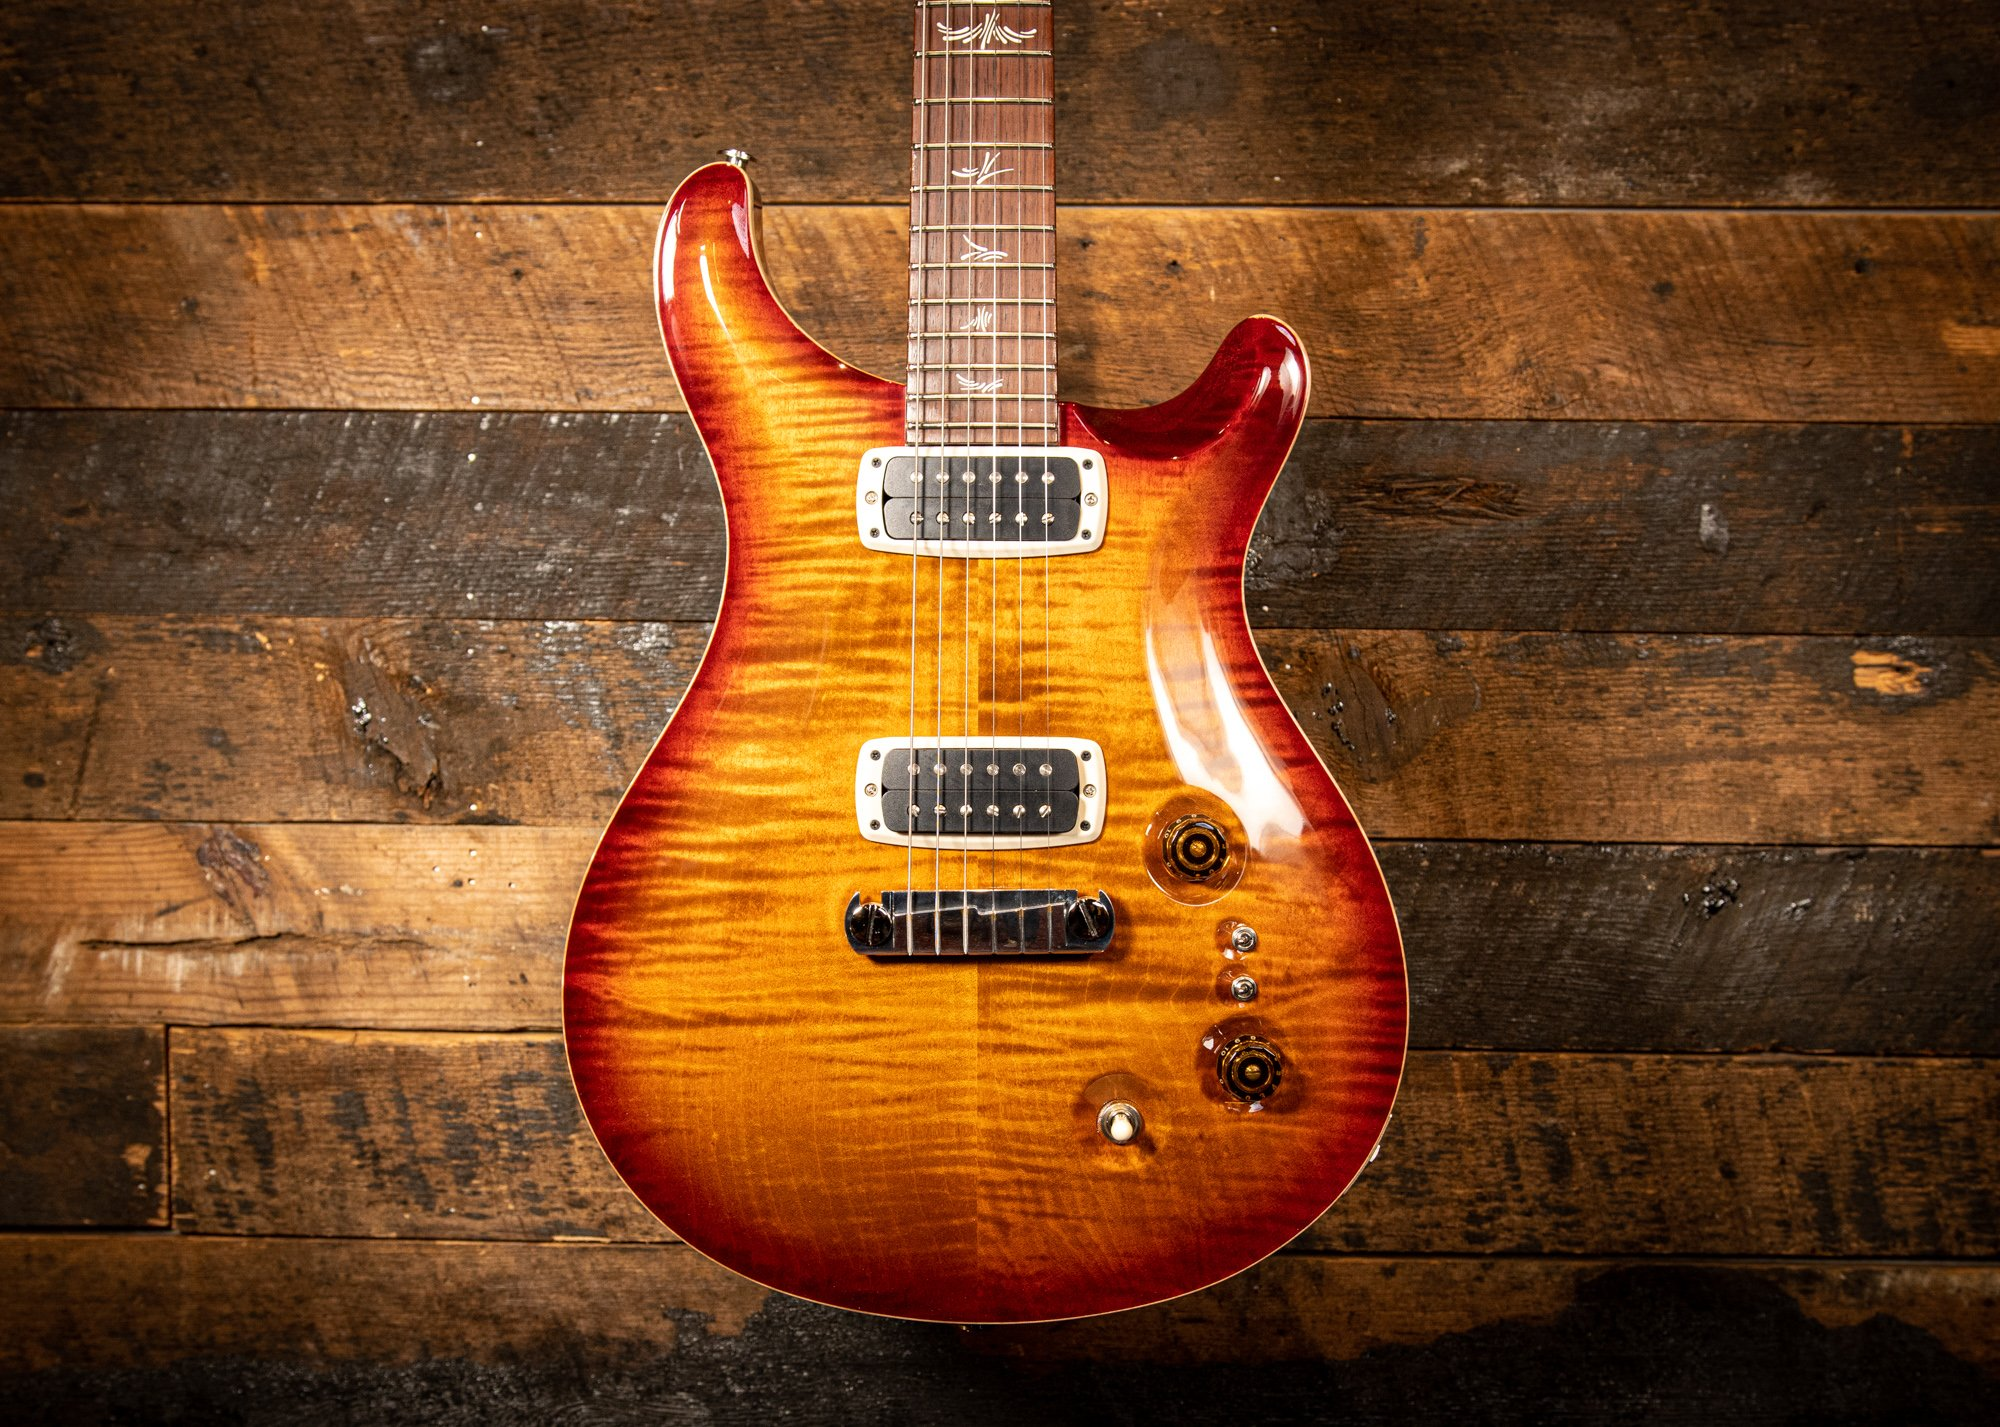 PRS Paul's Guitar Non-10 top in Dark Cherry-burst